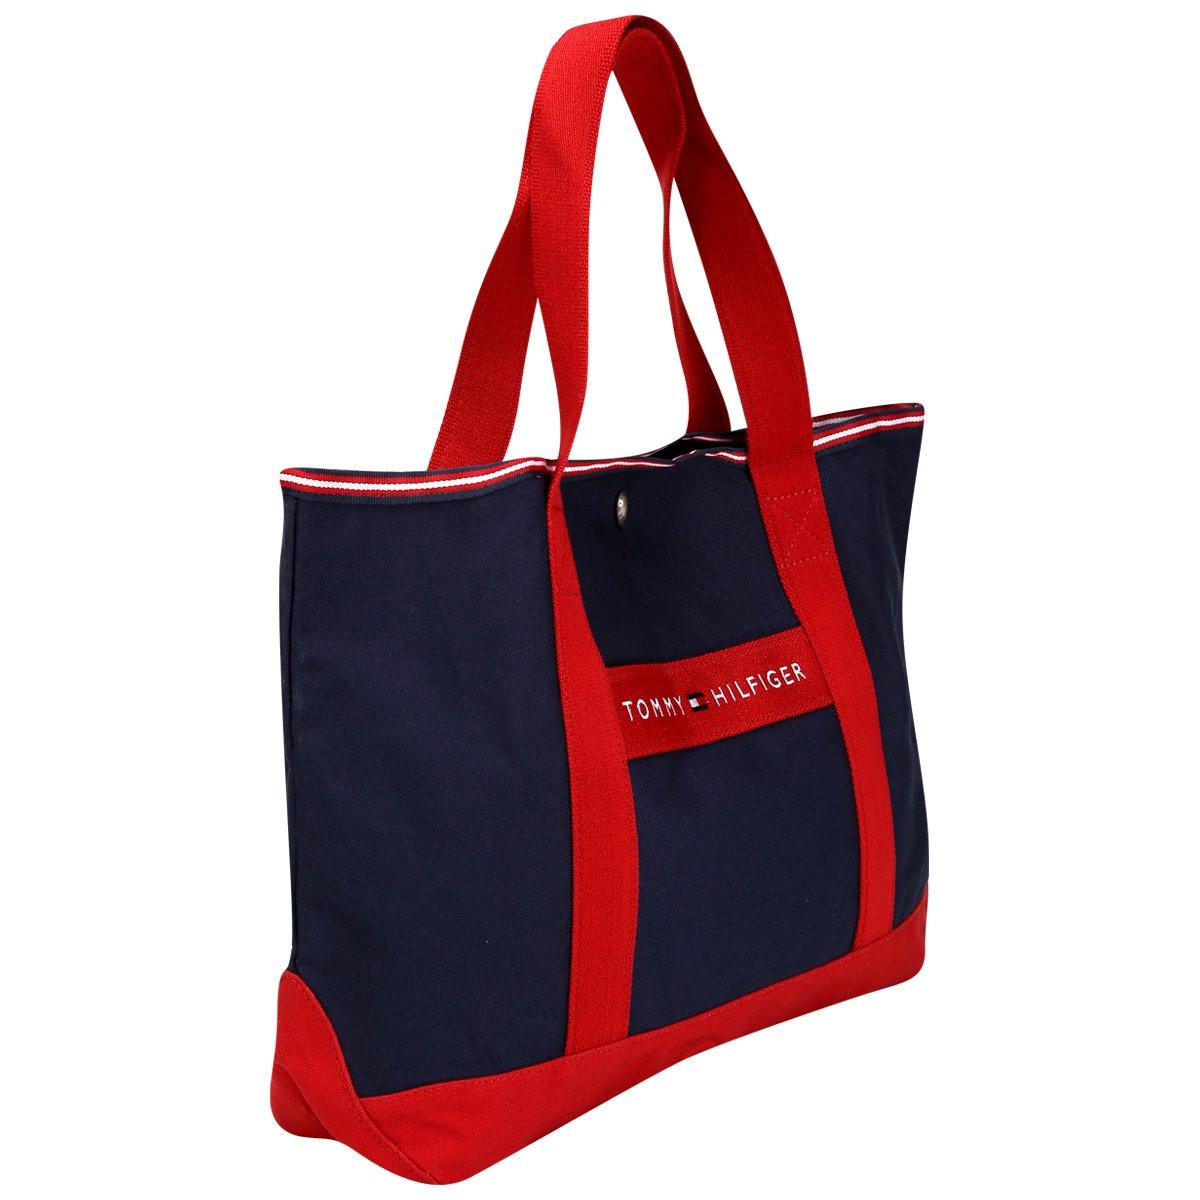 eea6e25b2507d Bolsa Tommy Hilfiger Shopper - Compre Agora